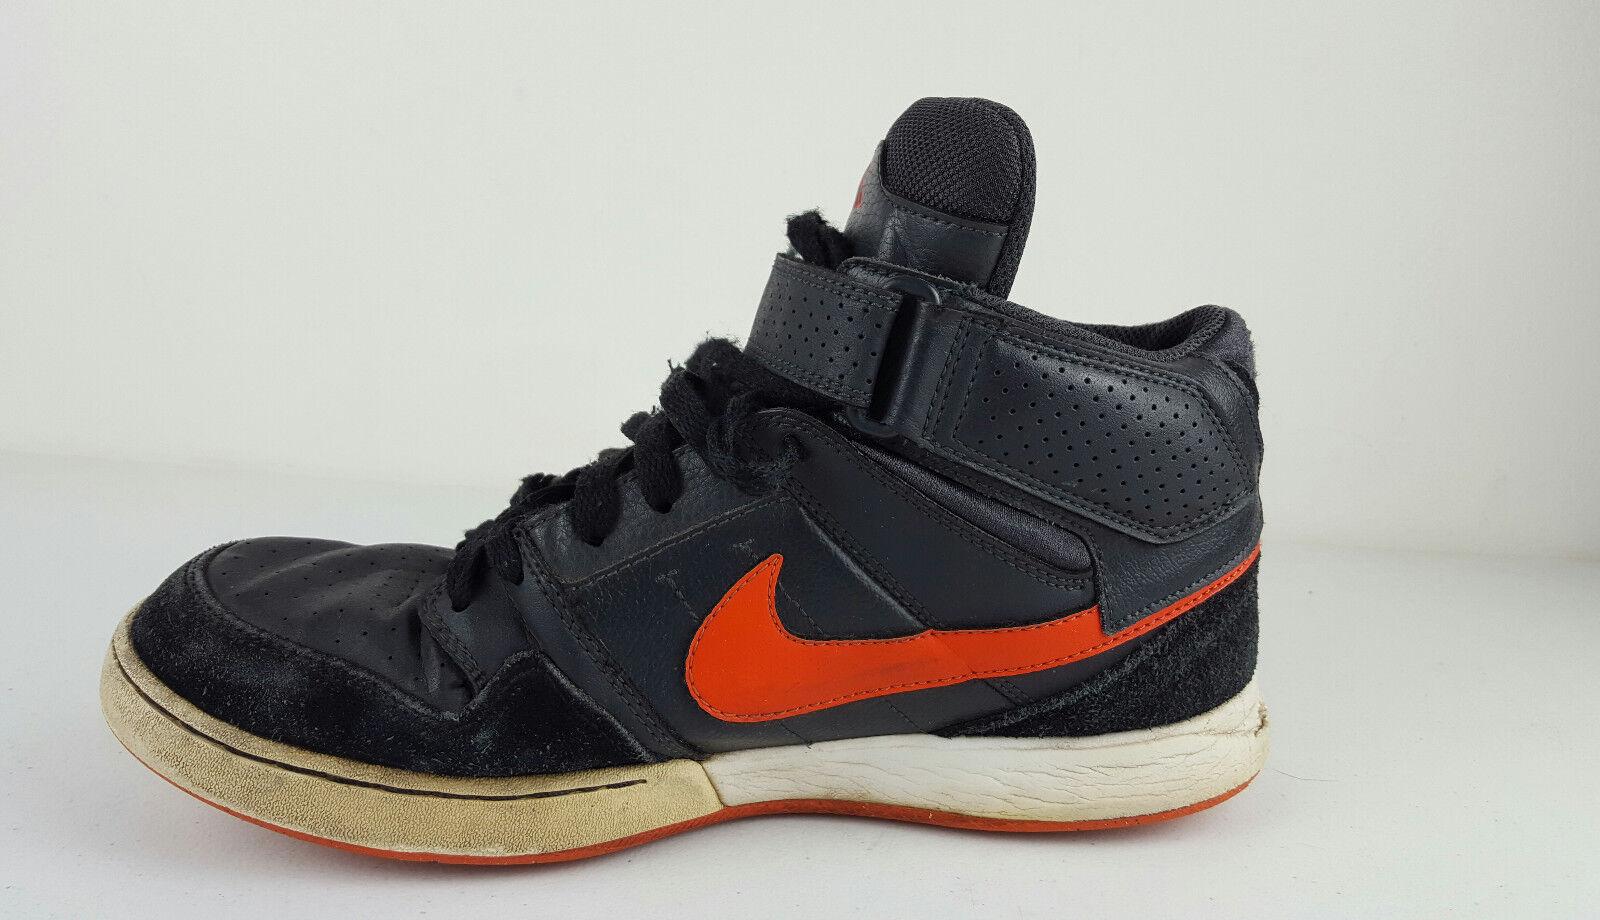 Nike Zoom Air Morgan 2 Mid Skateboard Strap Shoes Men's 9 407360-081  Casual wild